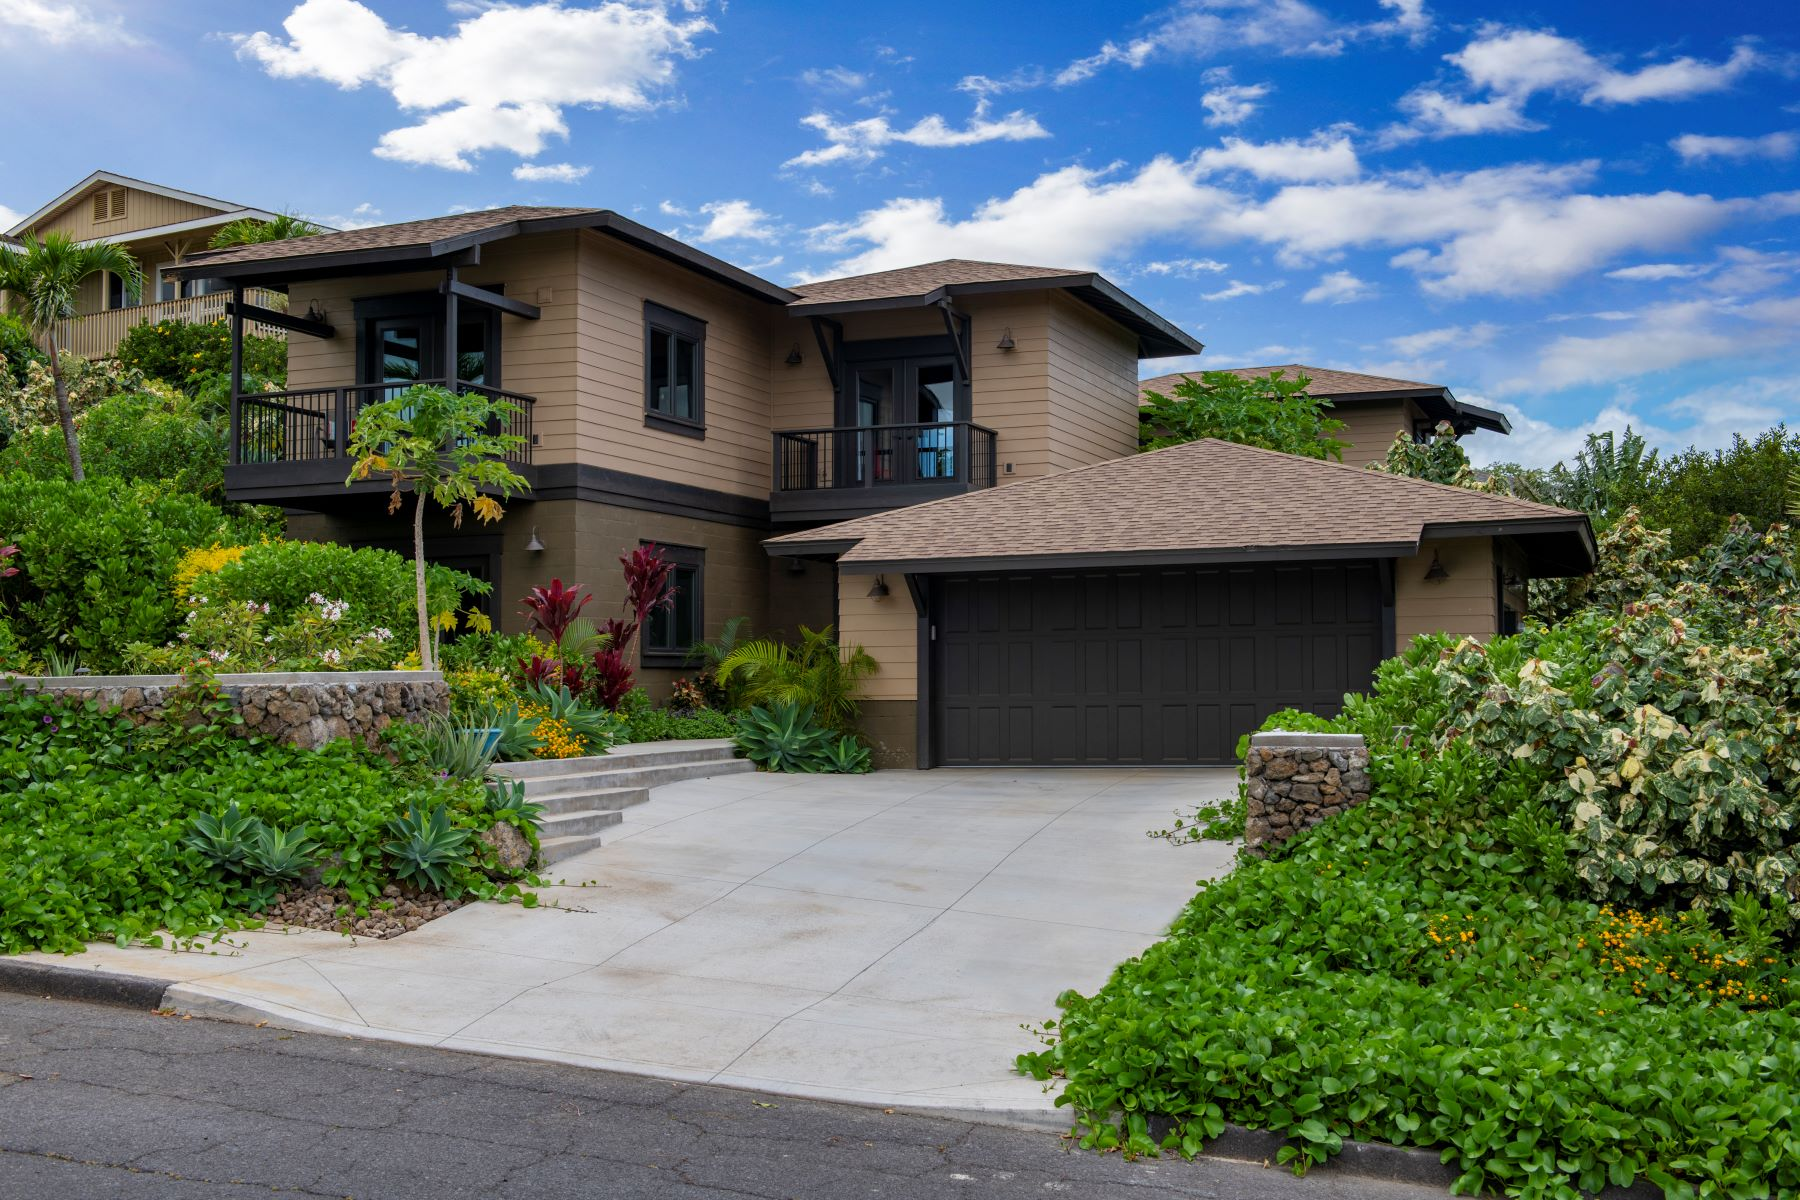 Single Family Homes 为 销售 在 68-1872 Puu Nui Street, Waikoloa Village, HI 96738 68-1872 Puu Nui Street 威克洛亚, 夏威夷 96738 美国